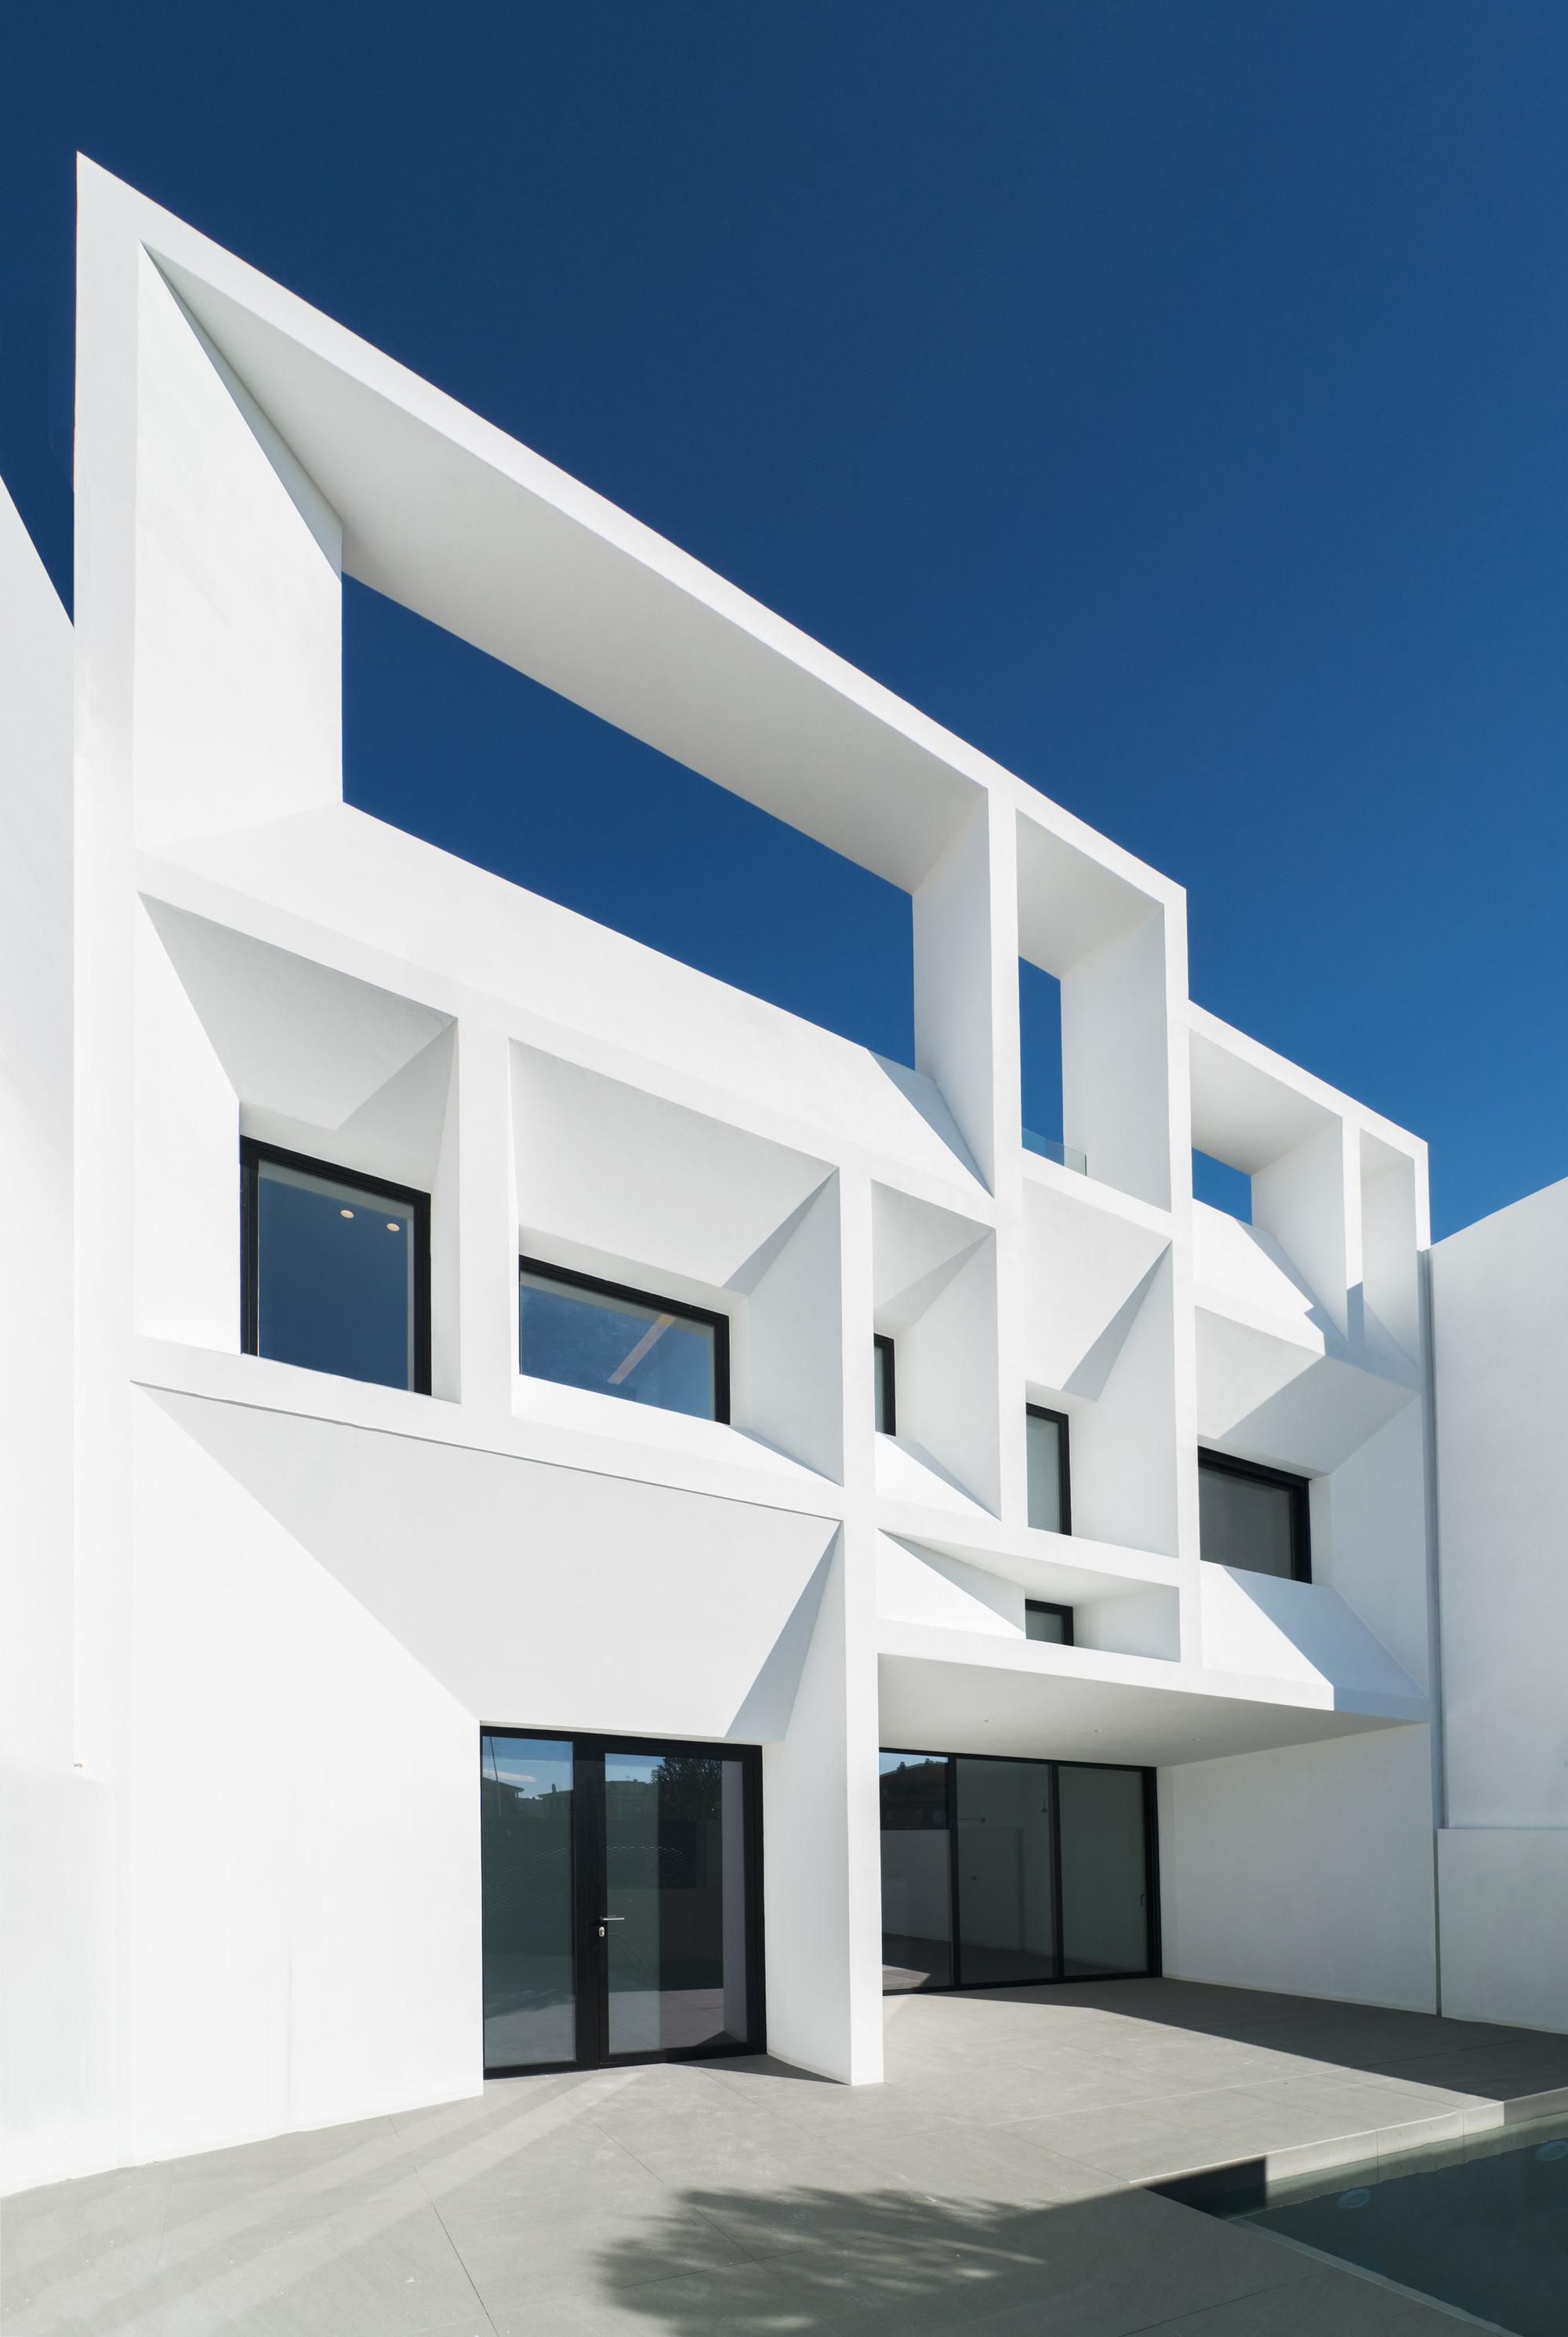 Brise soleil house rub n muedra estudio de arquitectura for Estudio de arquitectura